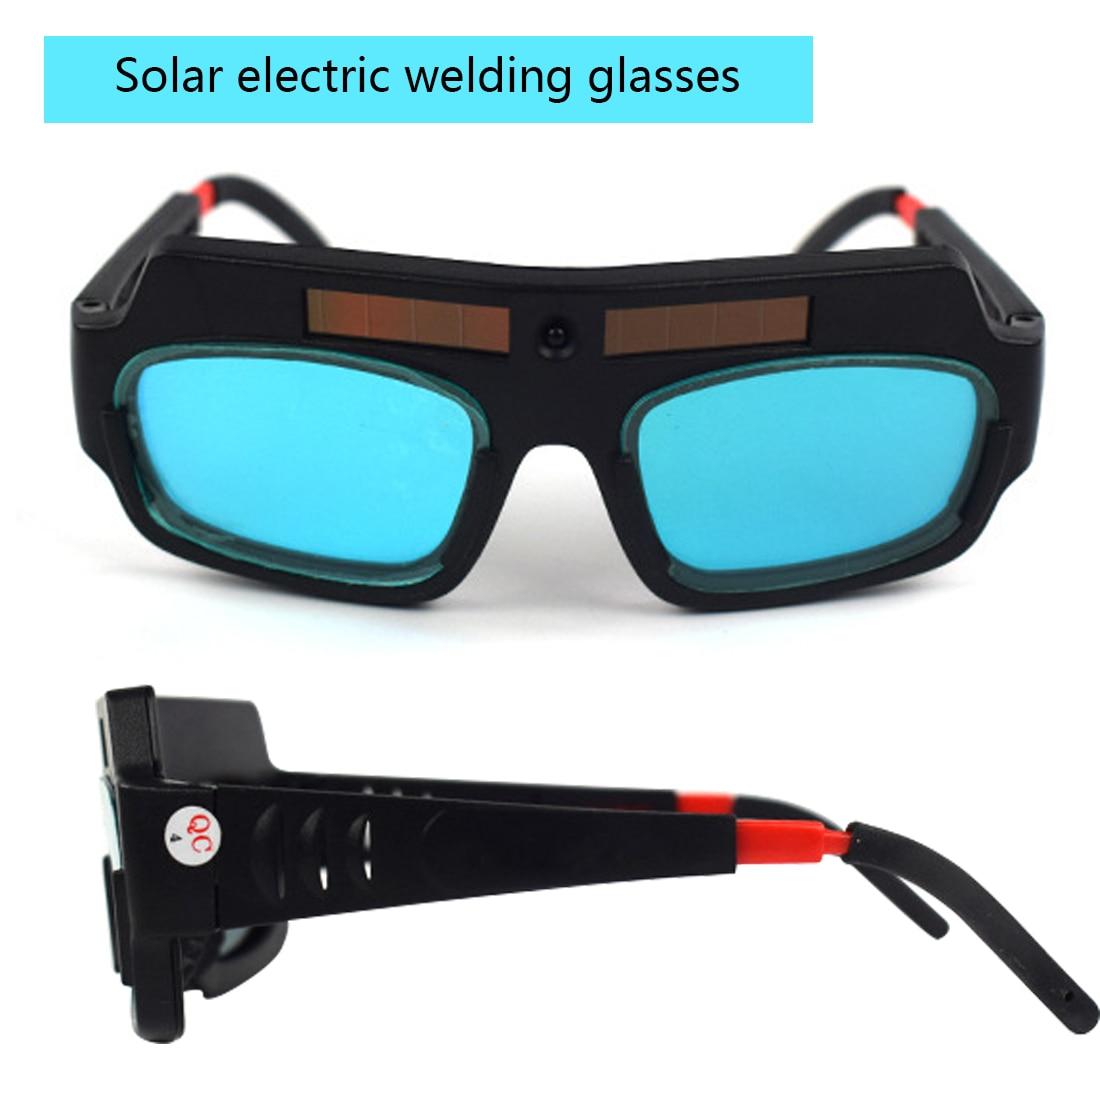 1Pc Great Goggles For Welding Protection Solar Powered Auto Darkening Welding Mask Helmet Goggle Welder Glasses Arc Lens